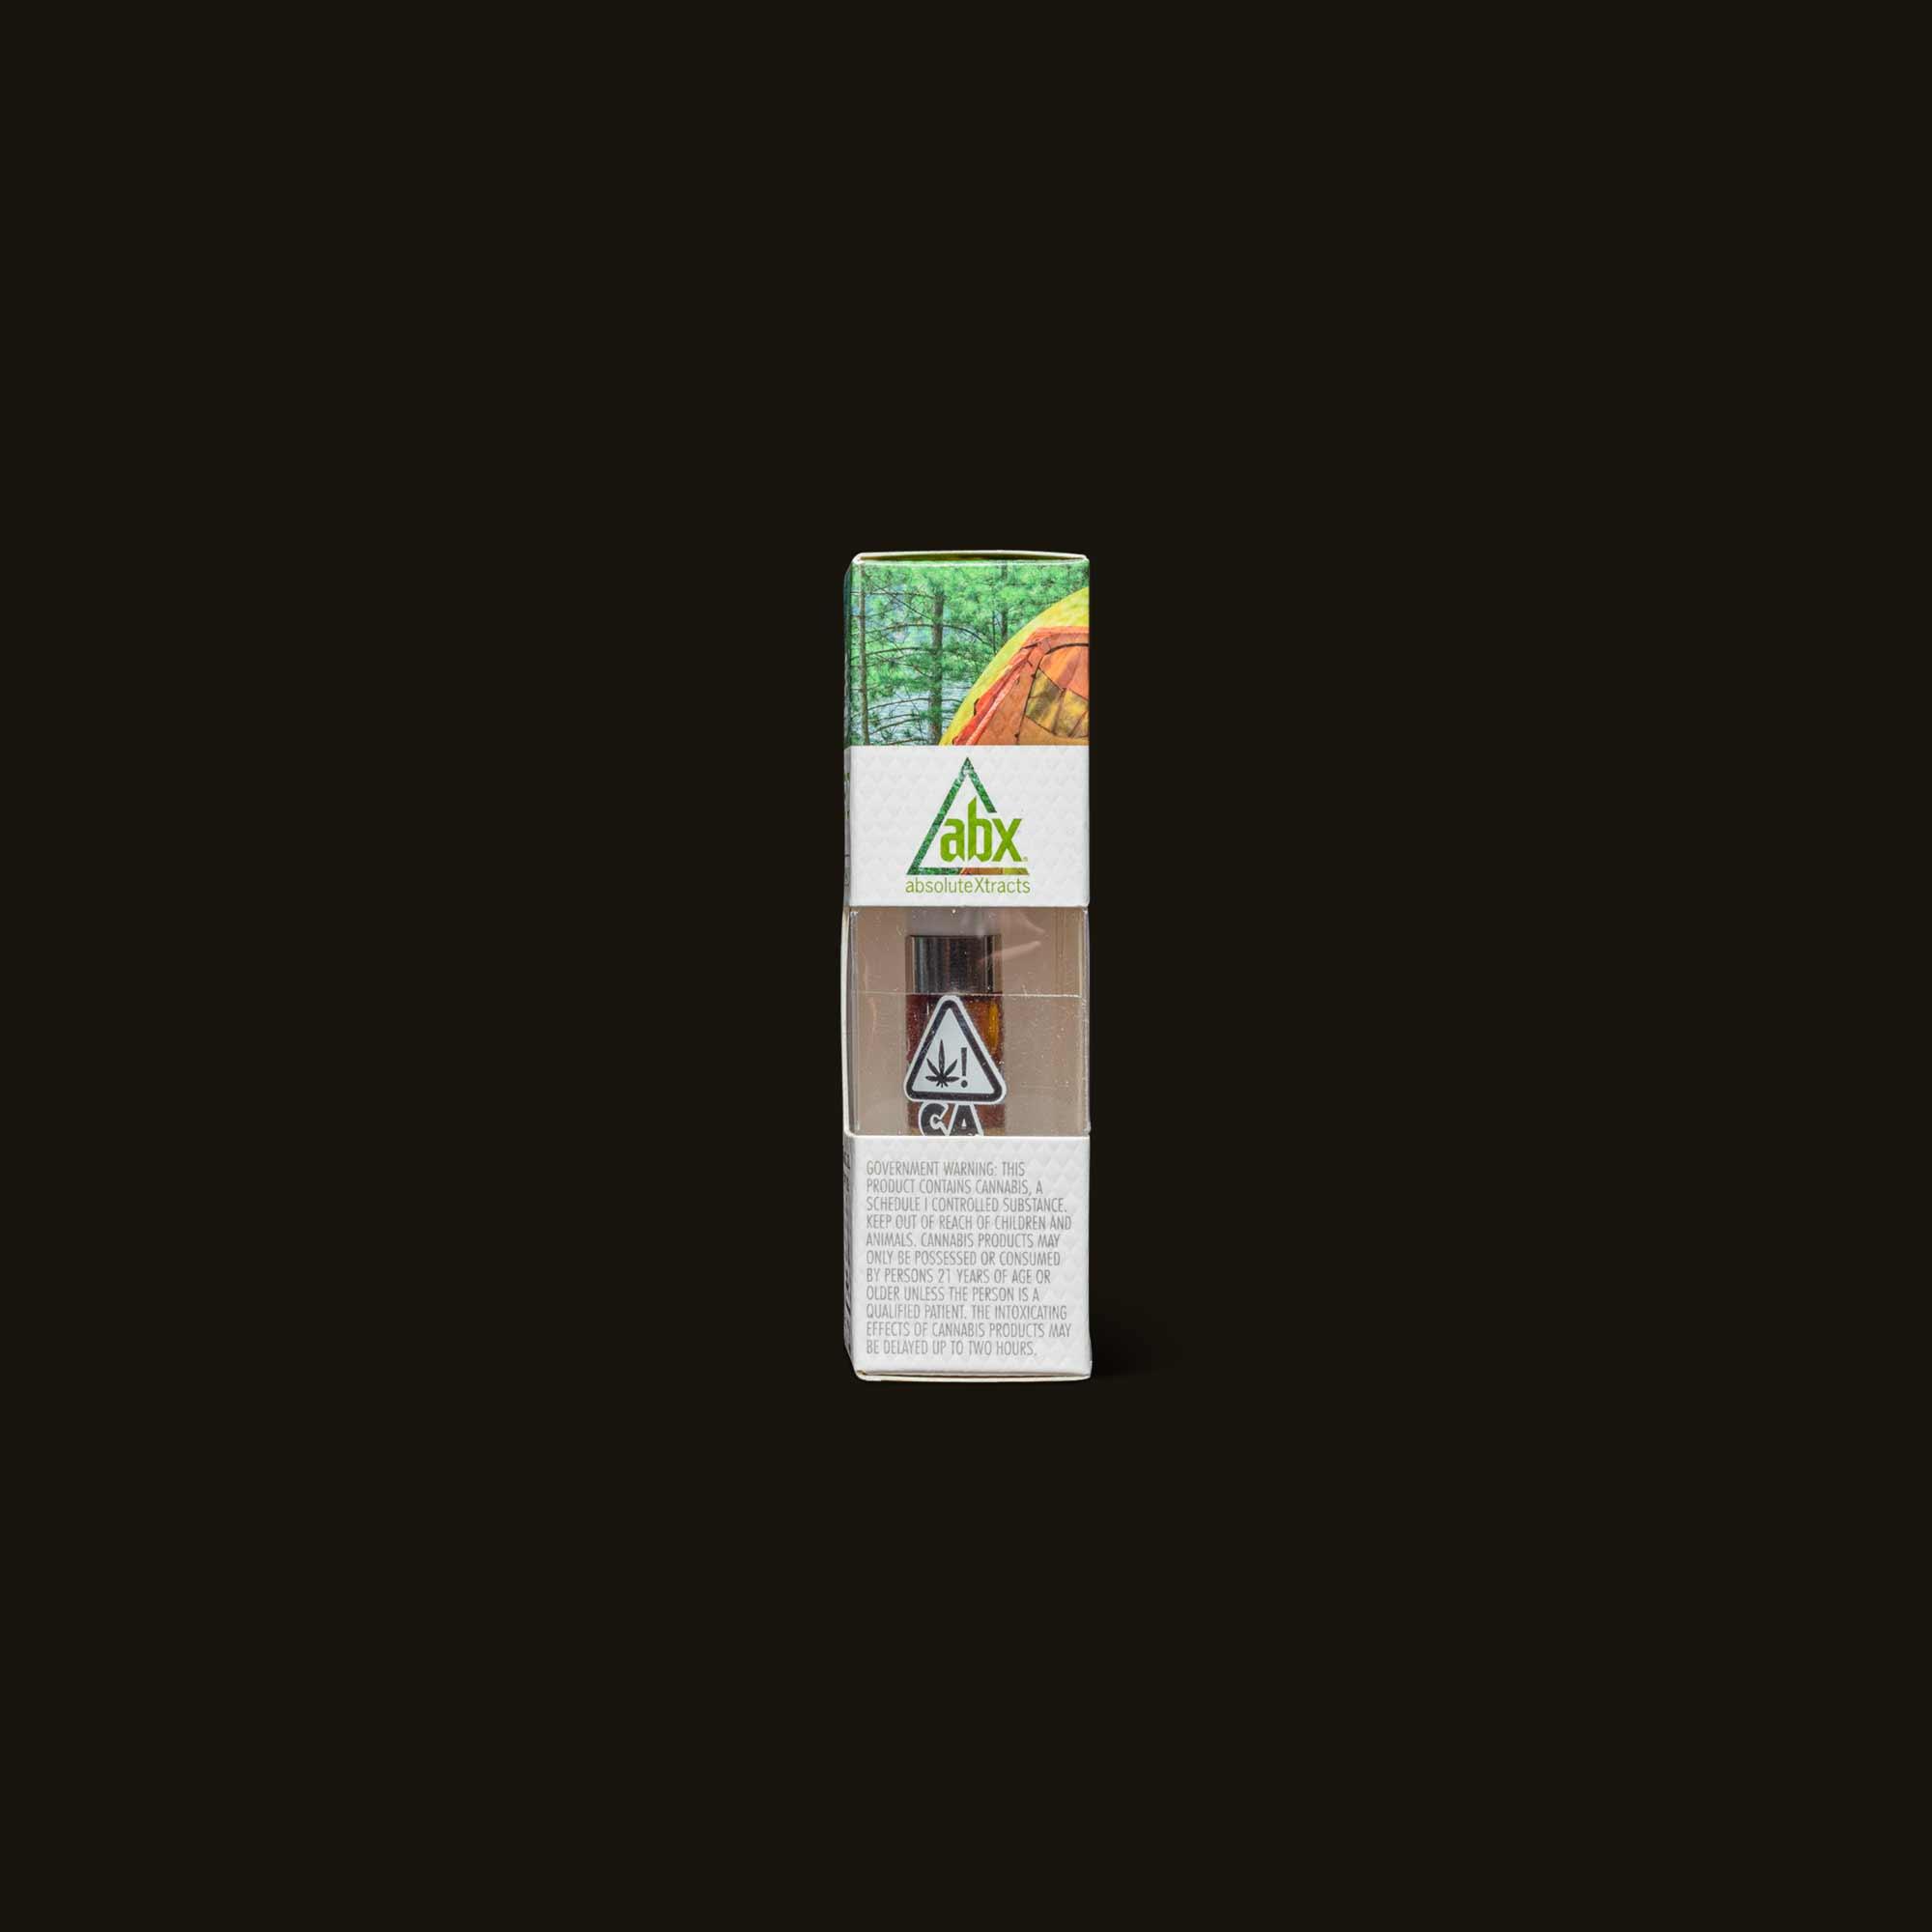 GSC Cartridge - 500mg cartridge